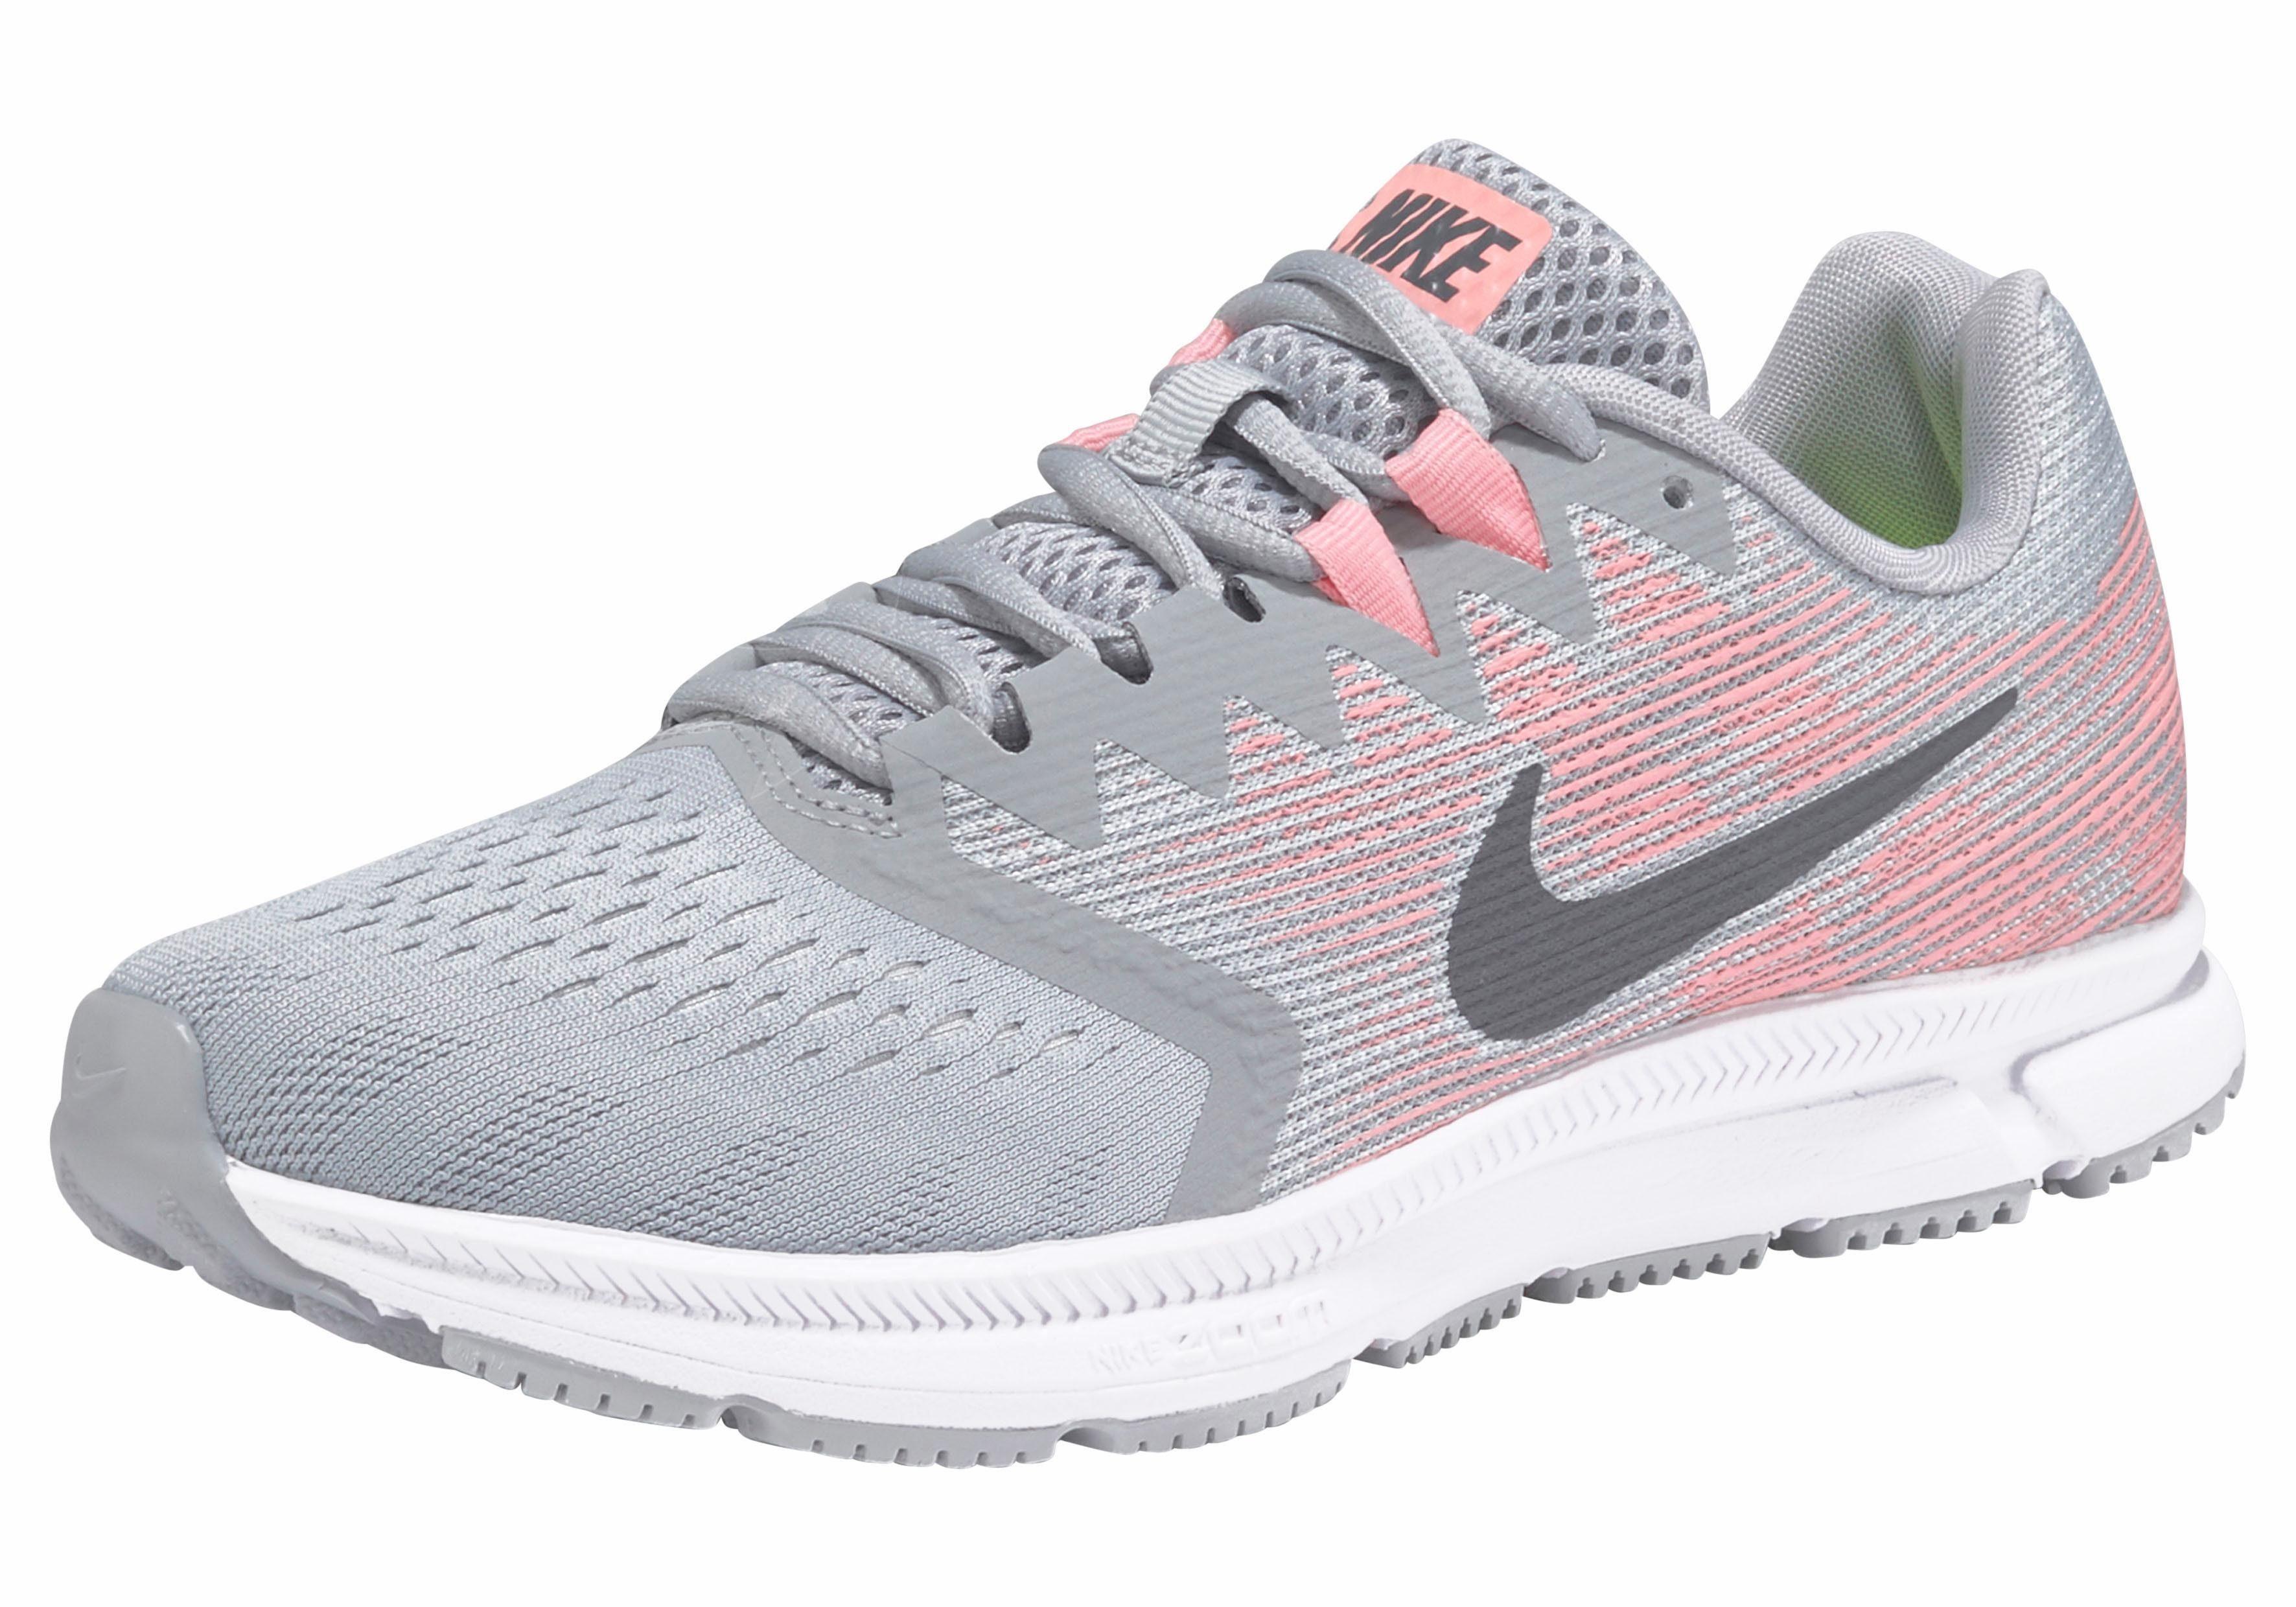 Nike Wmns Zoom Span 2 Laufschuh online kaufen  grau-apricot